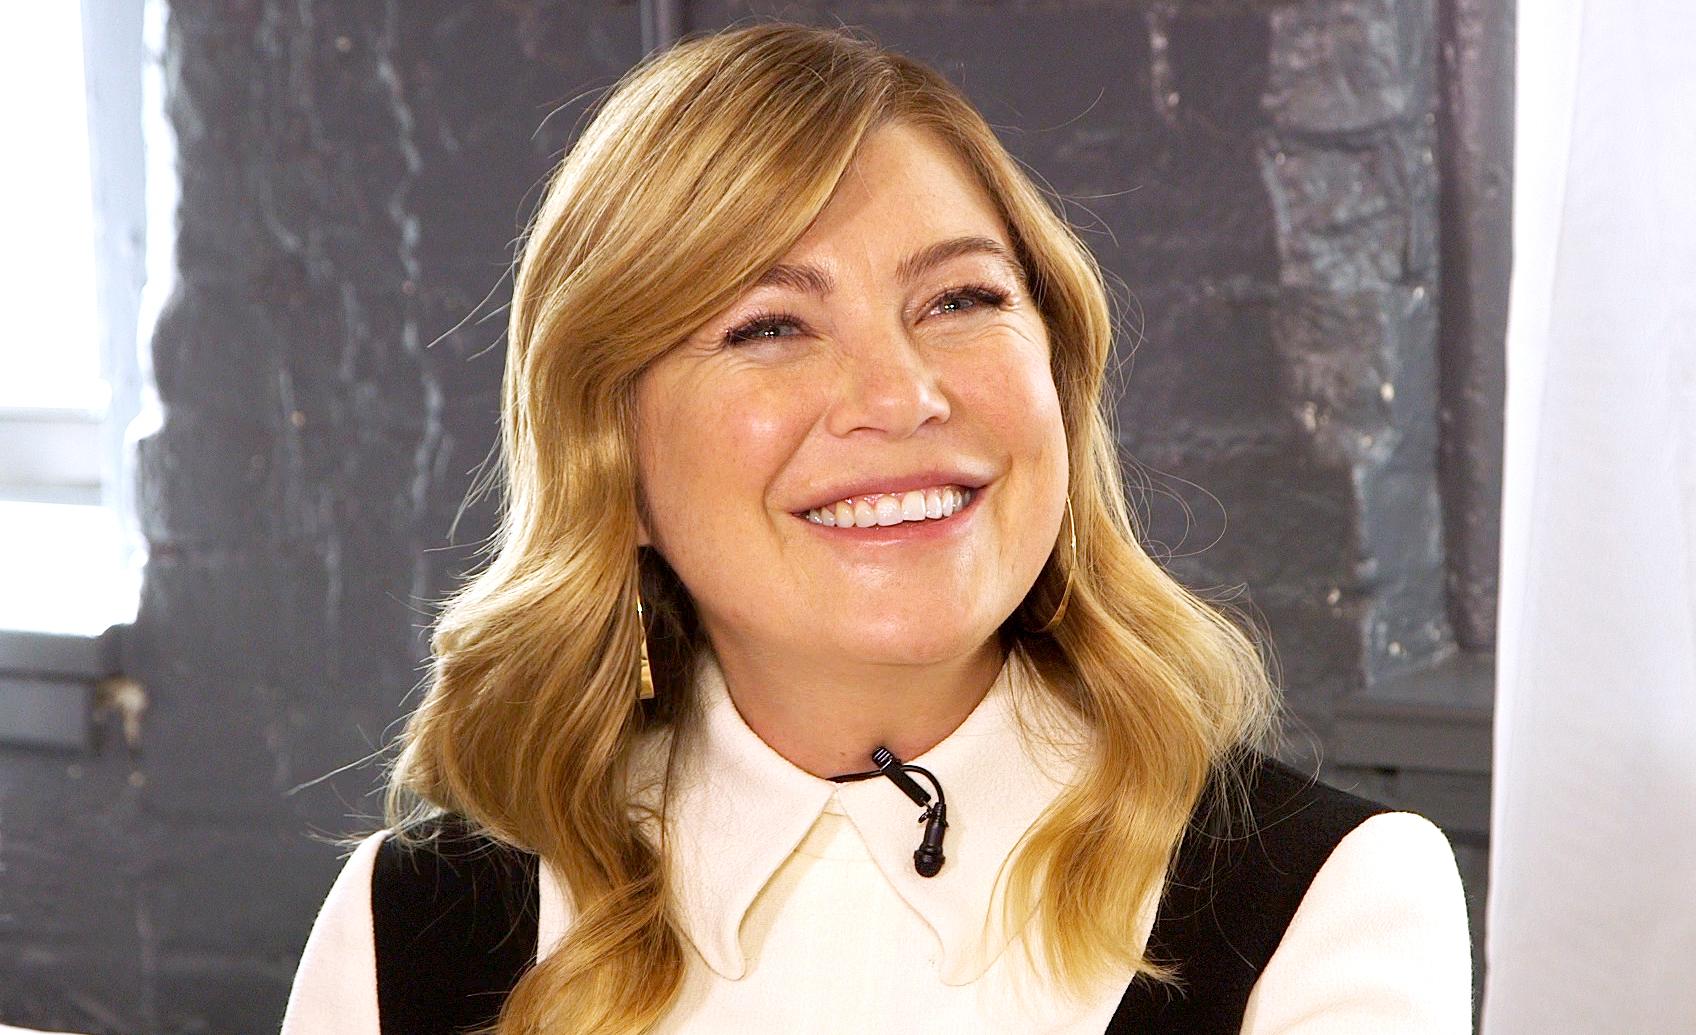 Ellen Pompeo Teases 'Grey's Anatomy' End